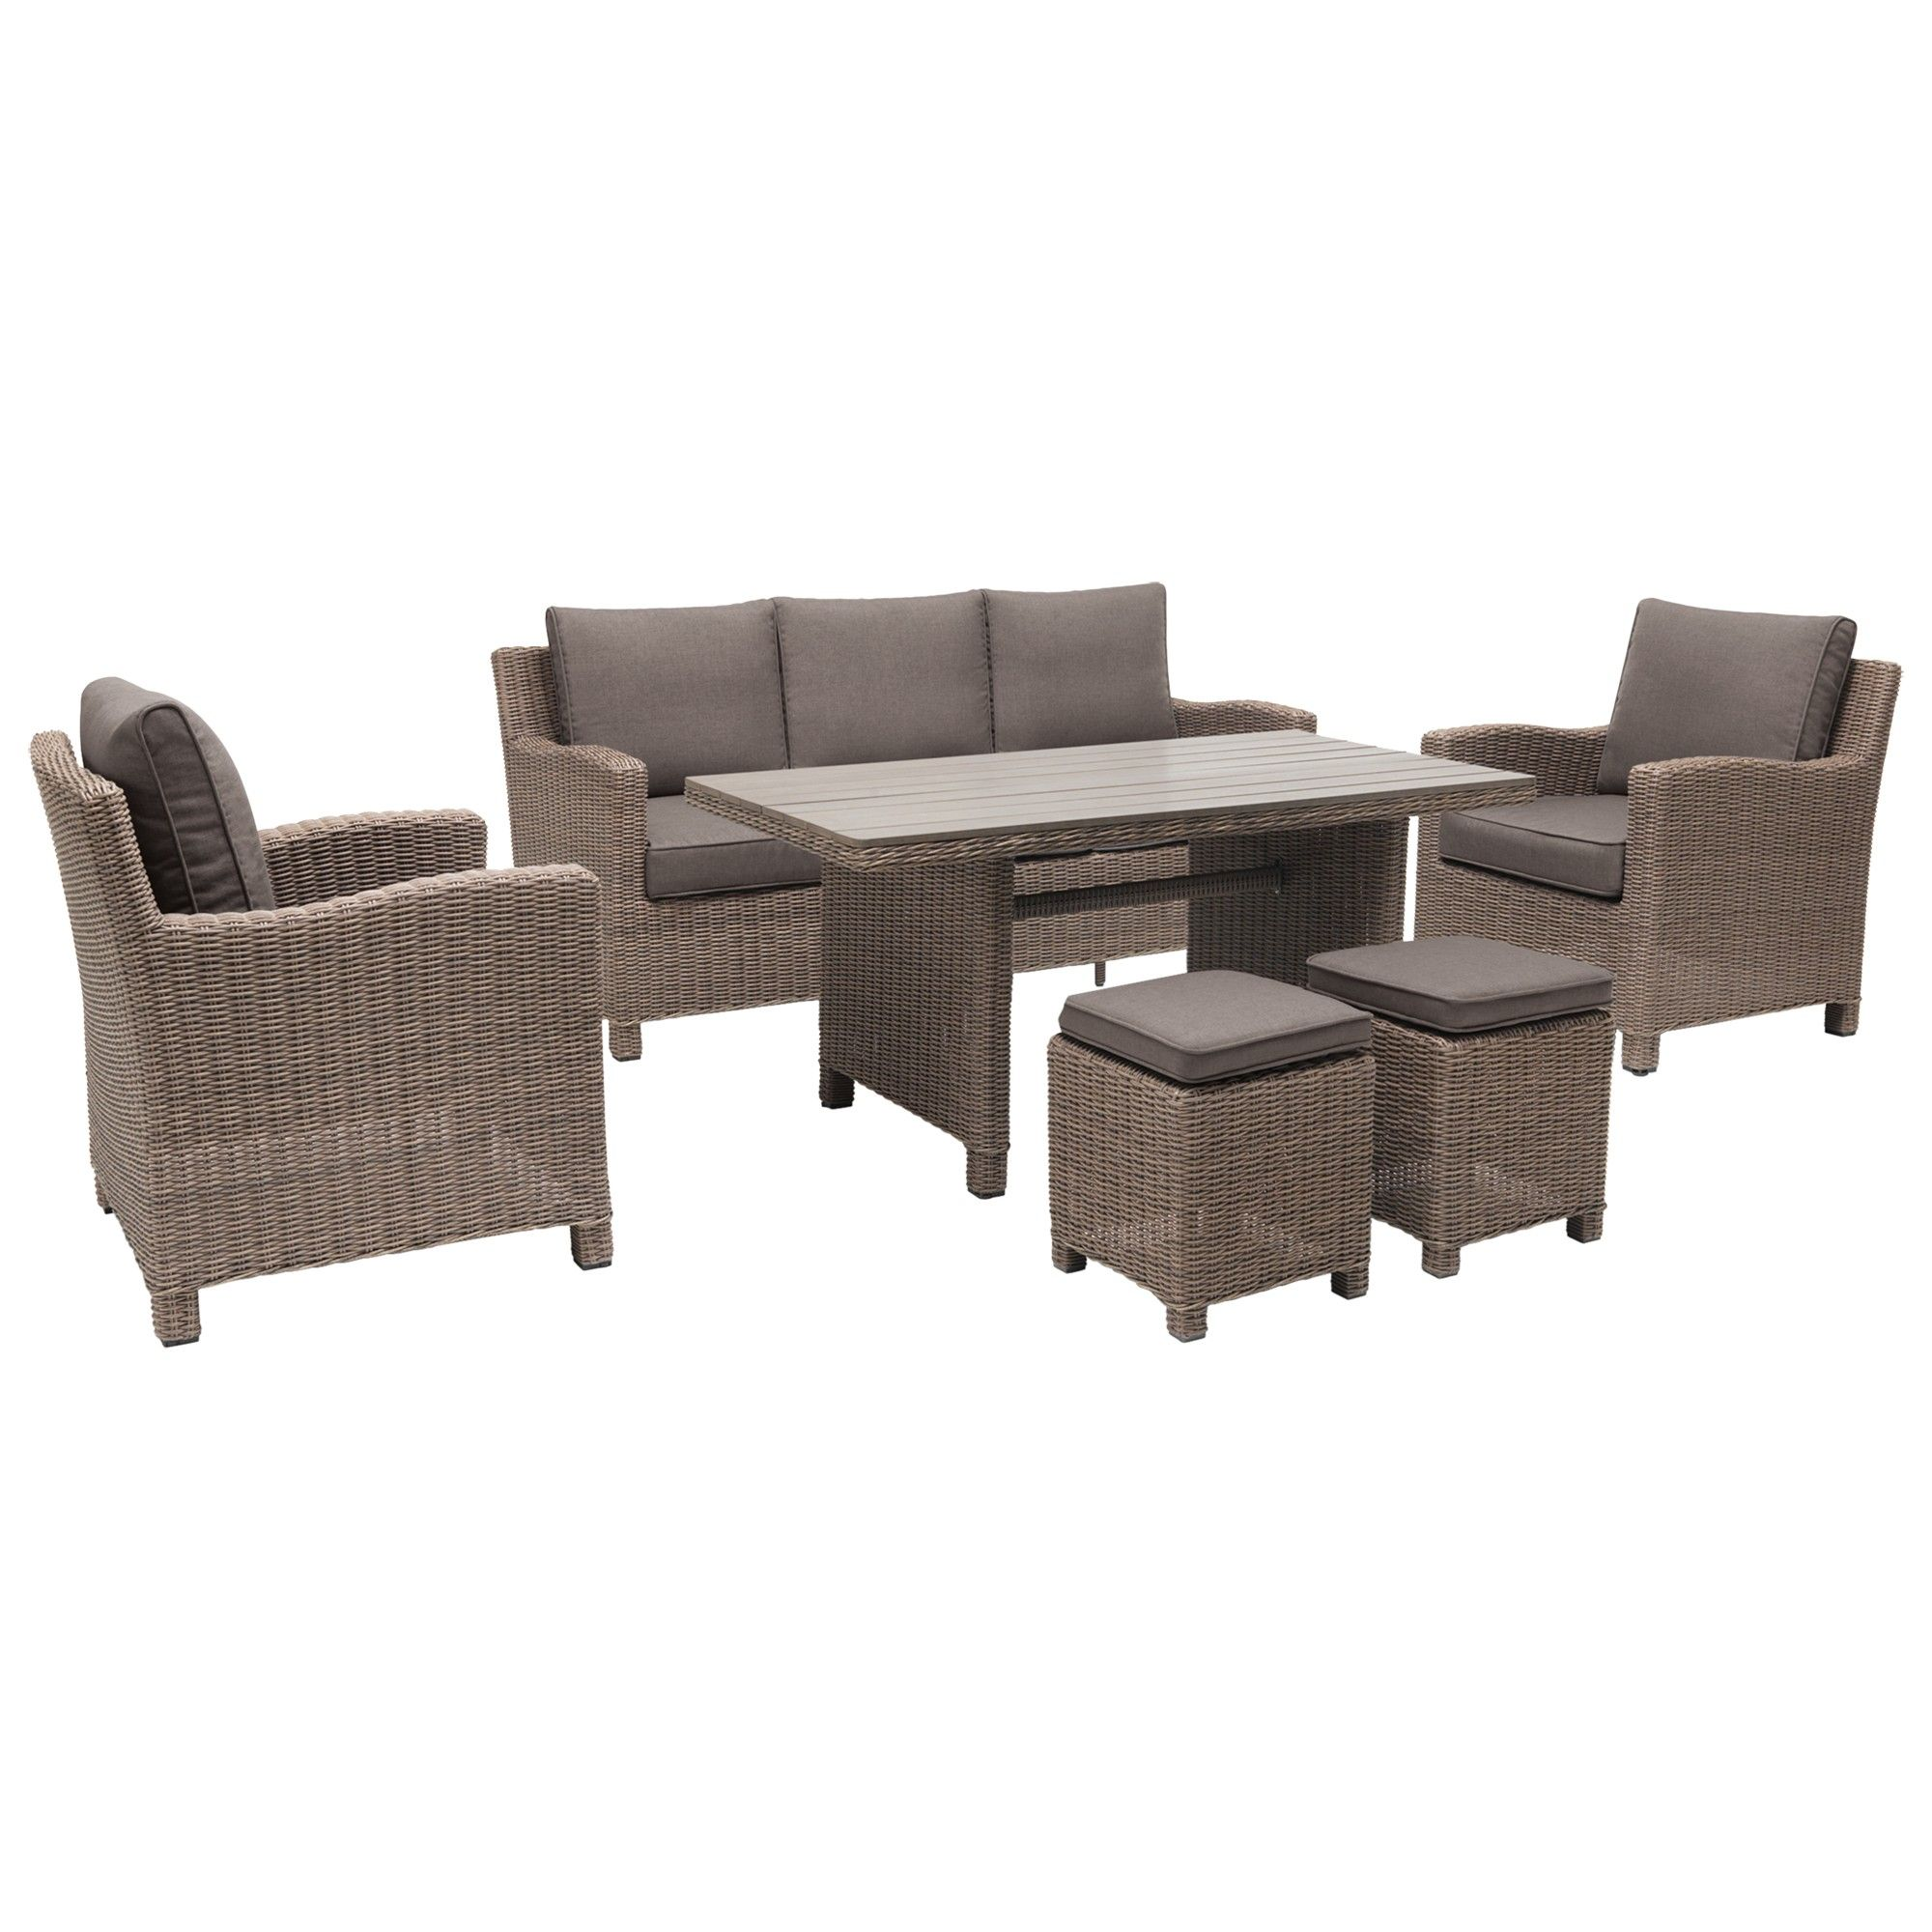 Kettler Palma Lounge Set Rattan Garden Dining Dining Sofa